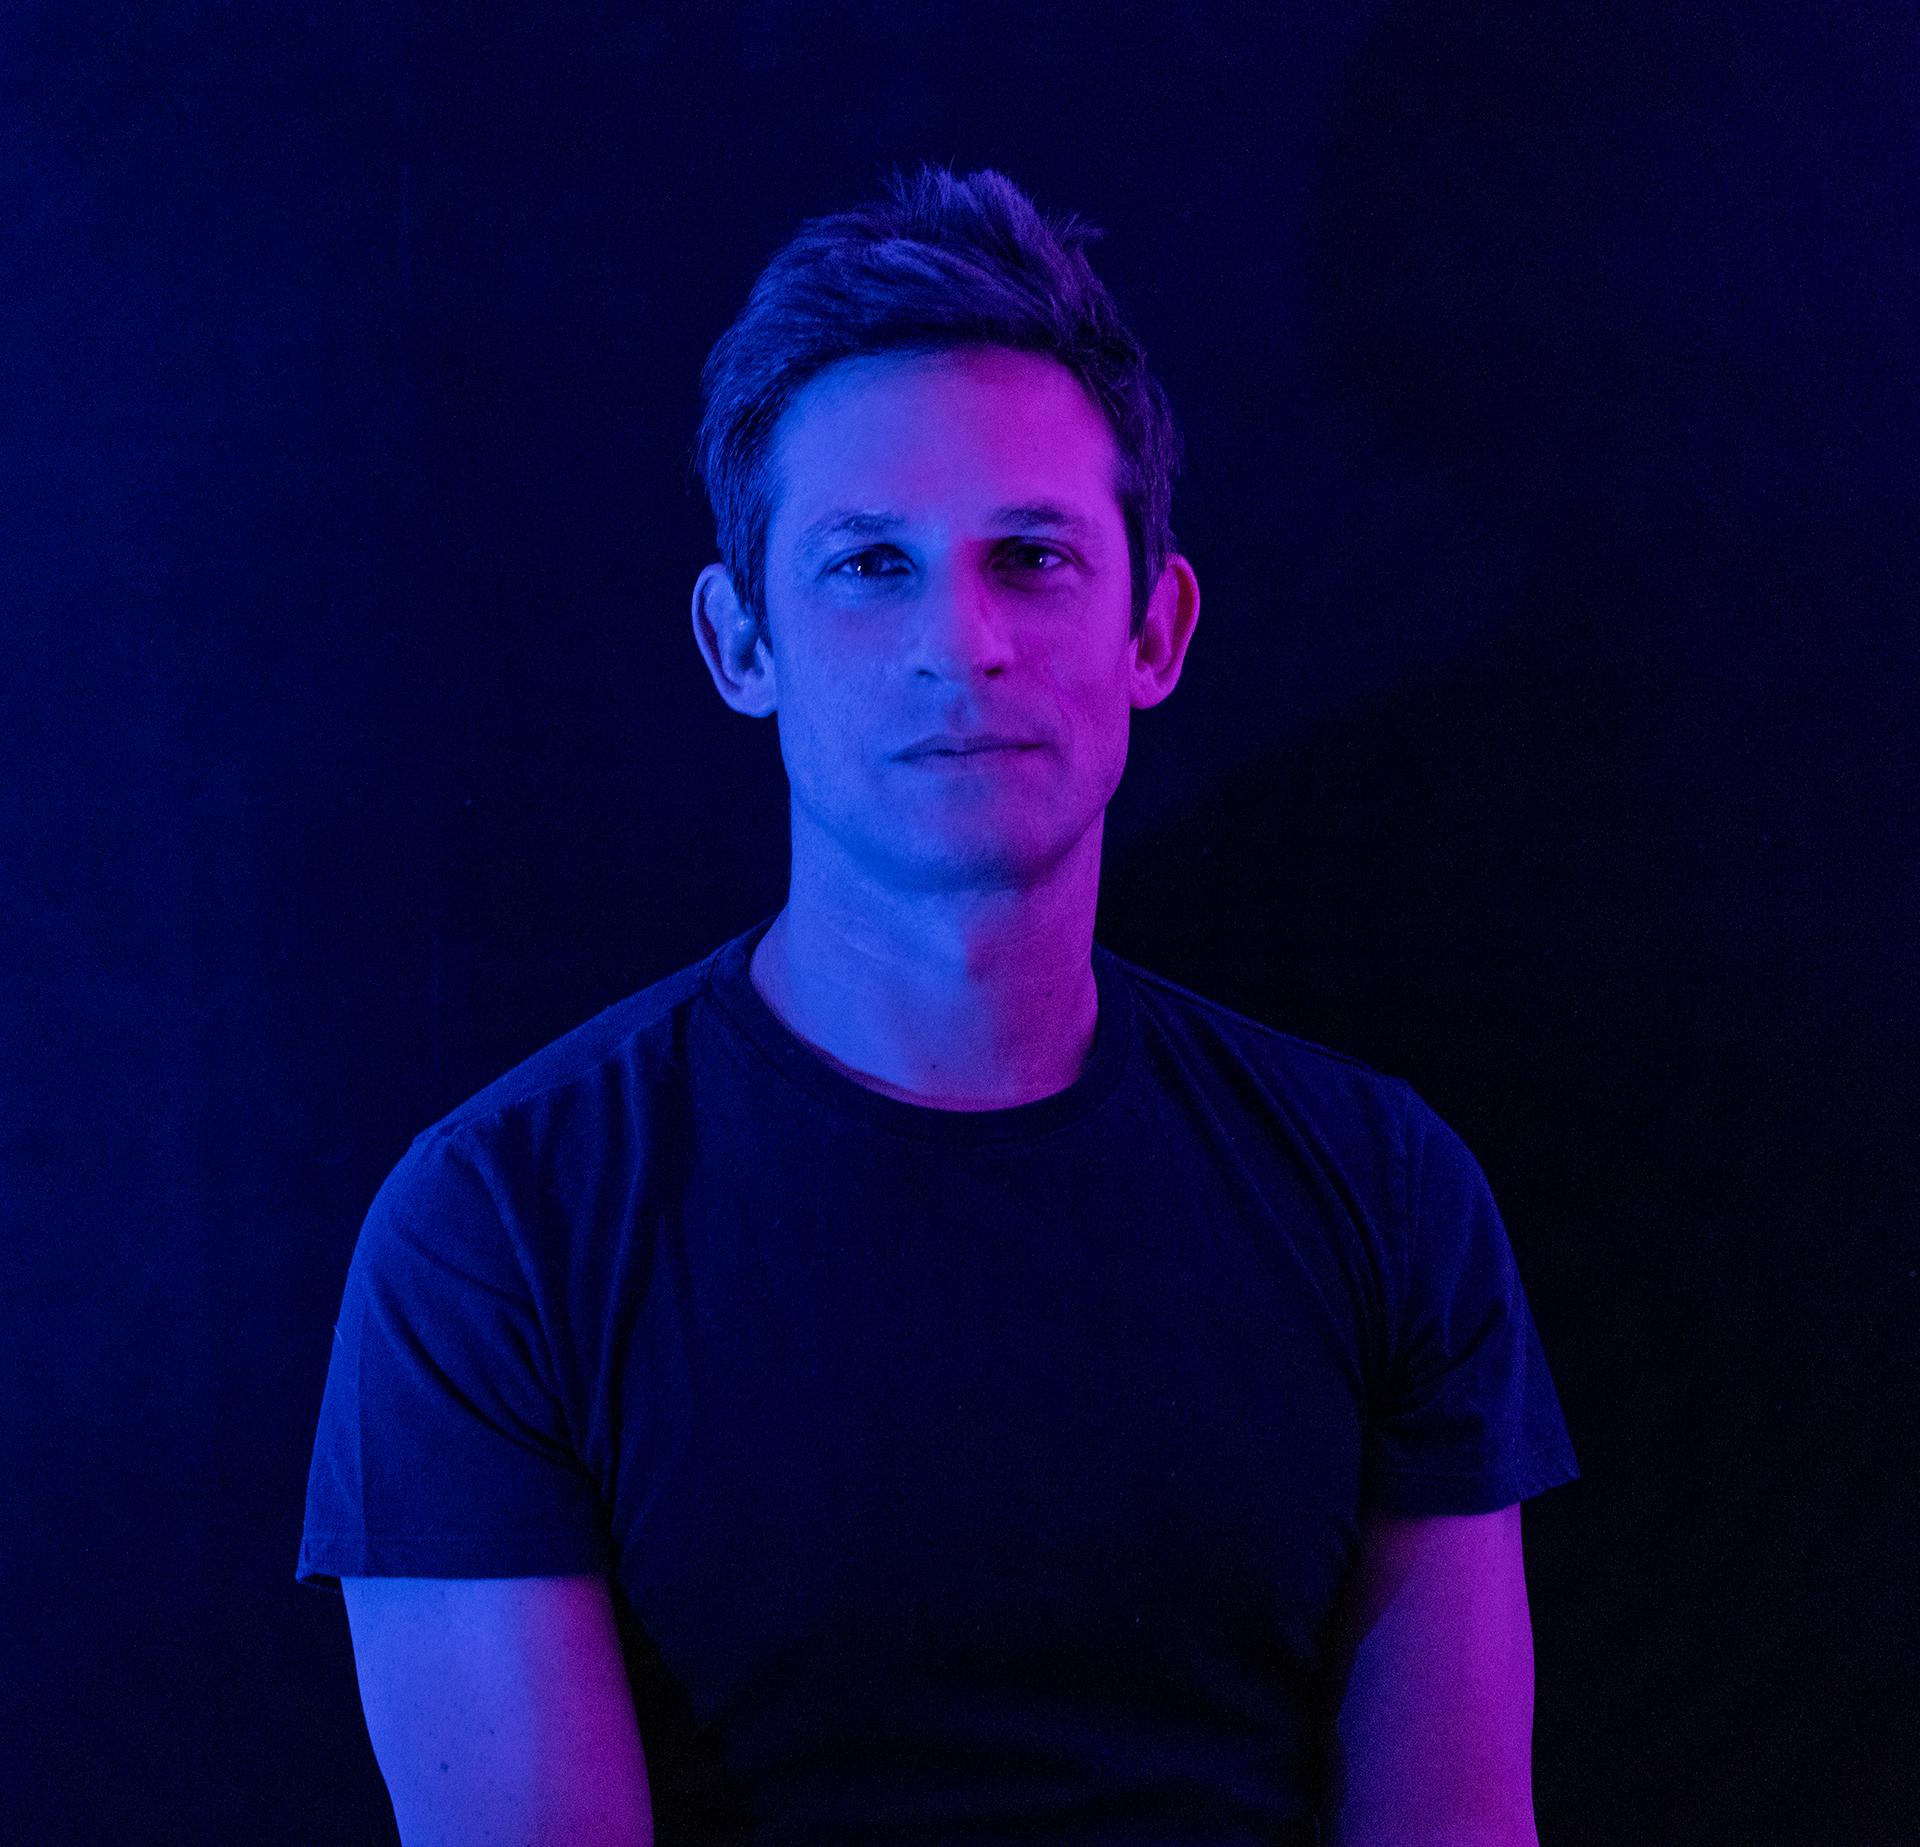 Artist Jonathan Rosen and Treum Collaborate on Massive NFT Drop